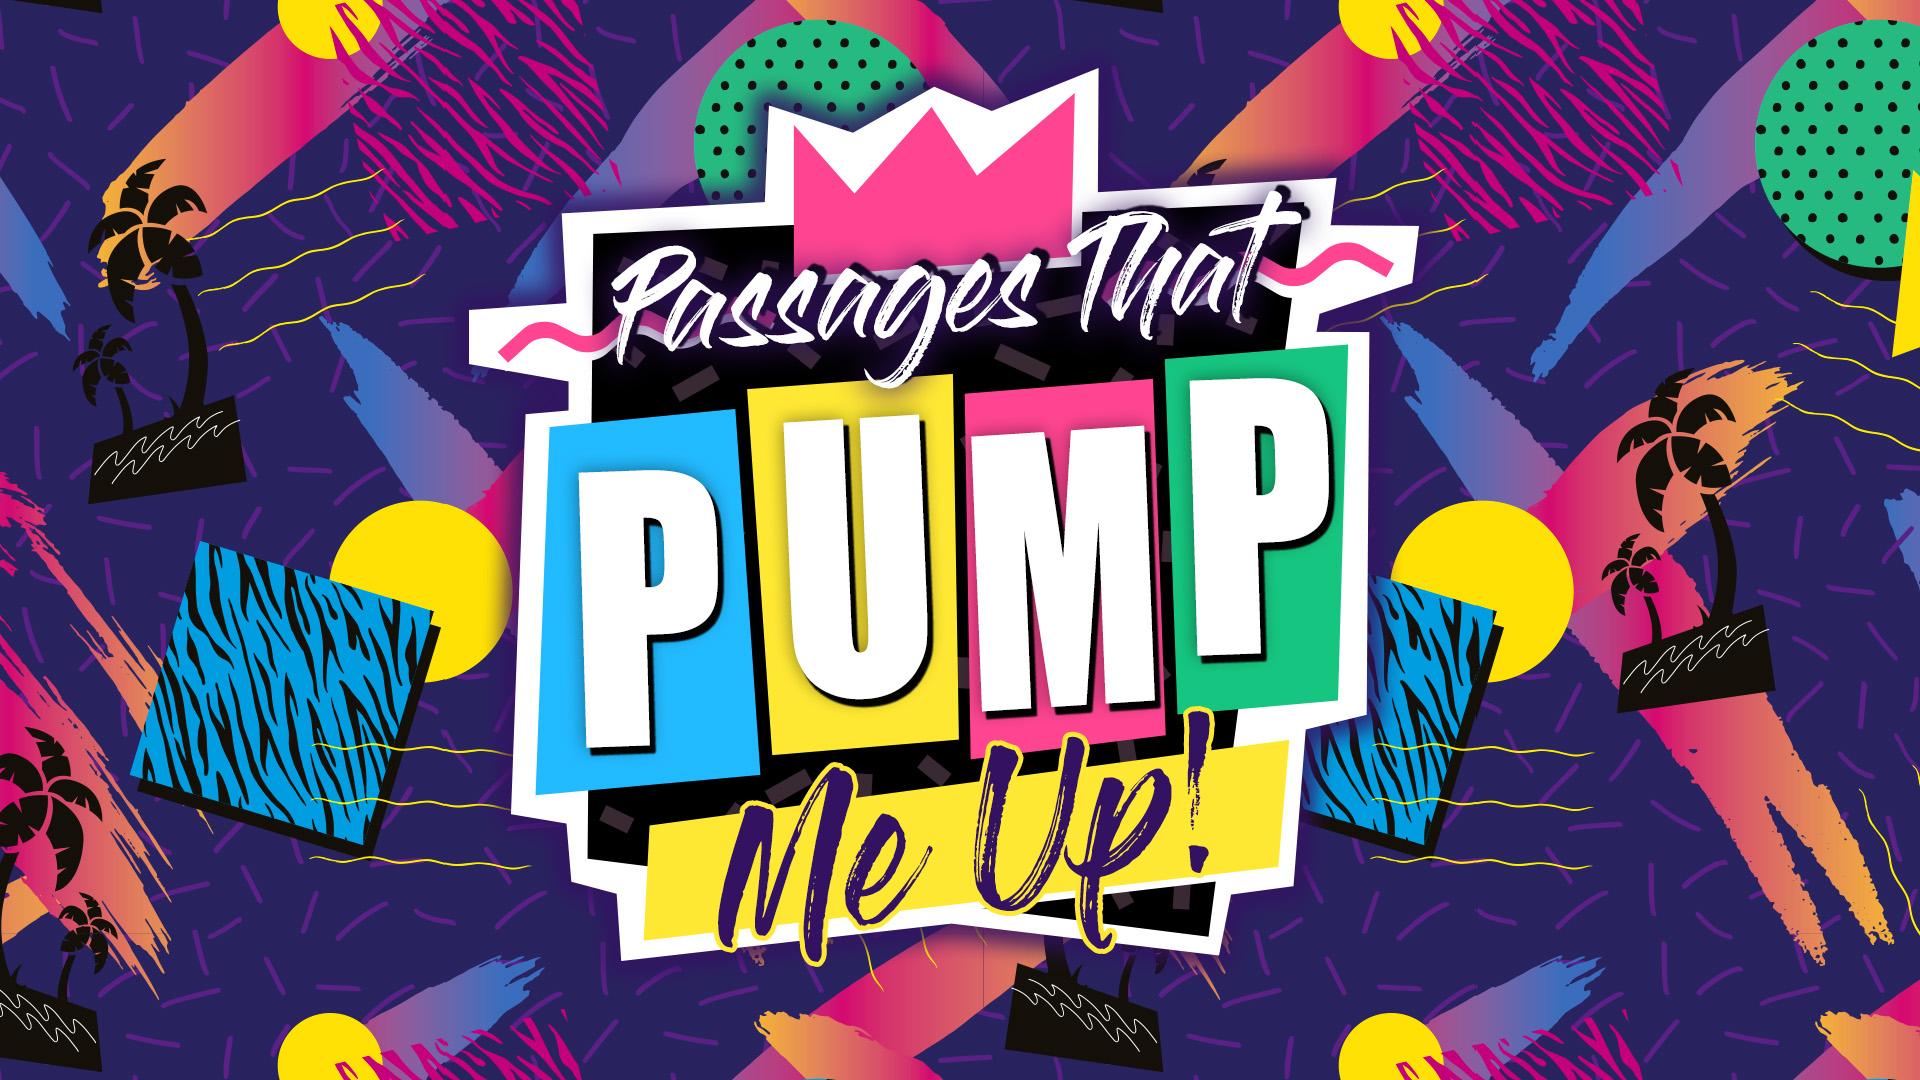 Passages That Pump Me Up - Series Title